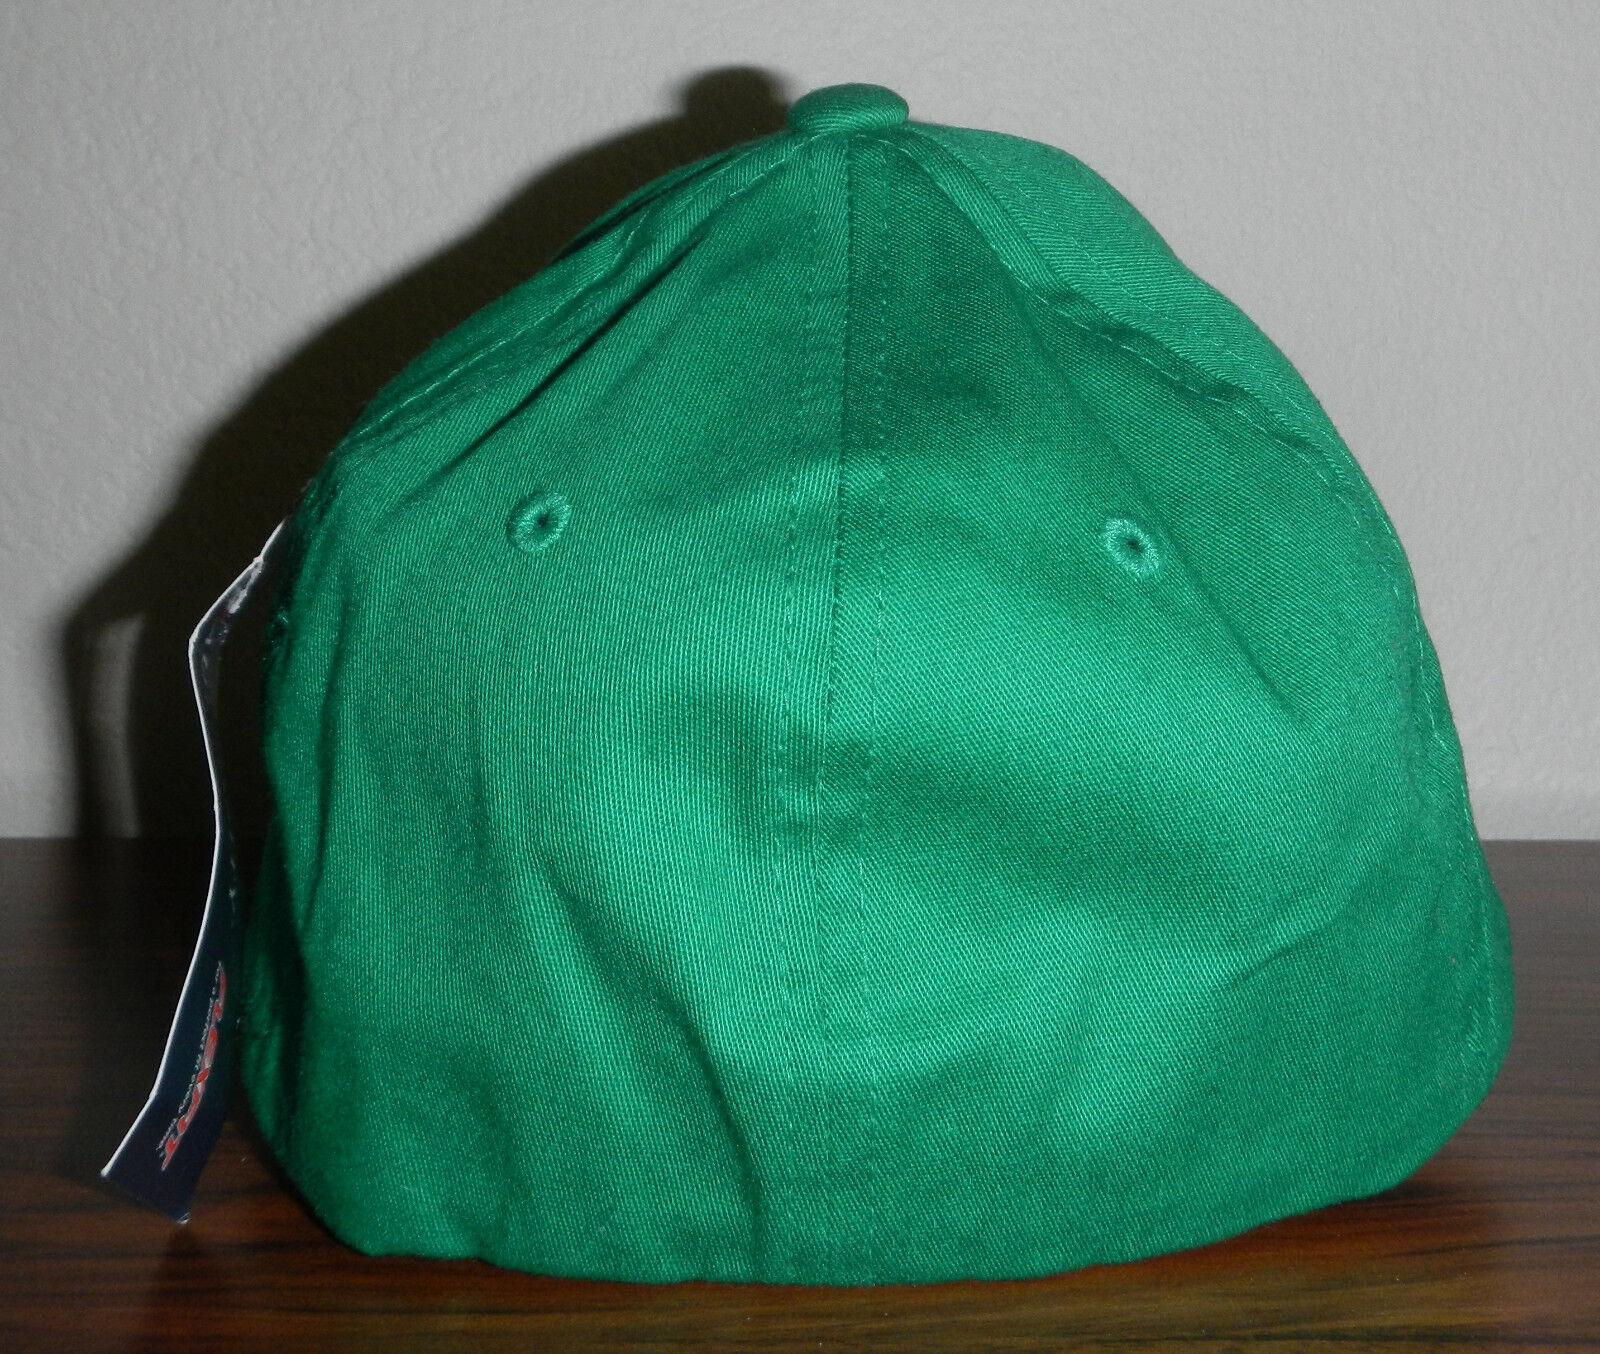 Nwt The Mexican Mr Size Hotcho Hot Dog Baseball Hat Cap Flexfit Topi Vintage Import Snapback 02 S